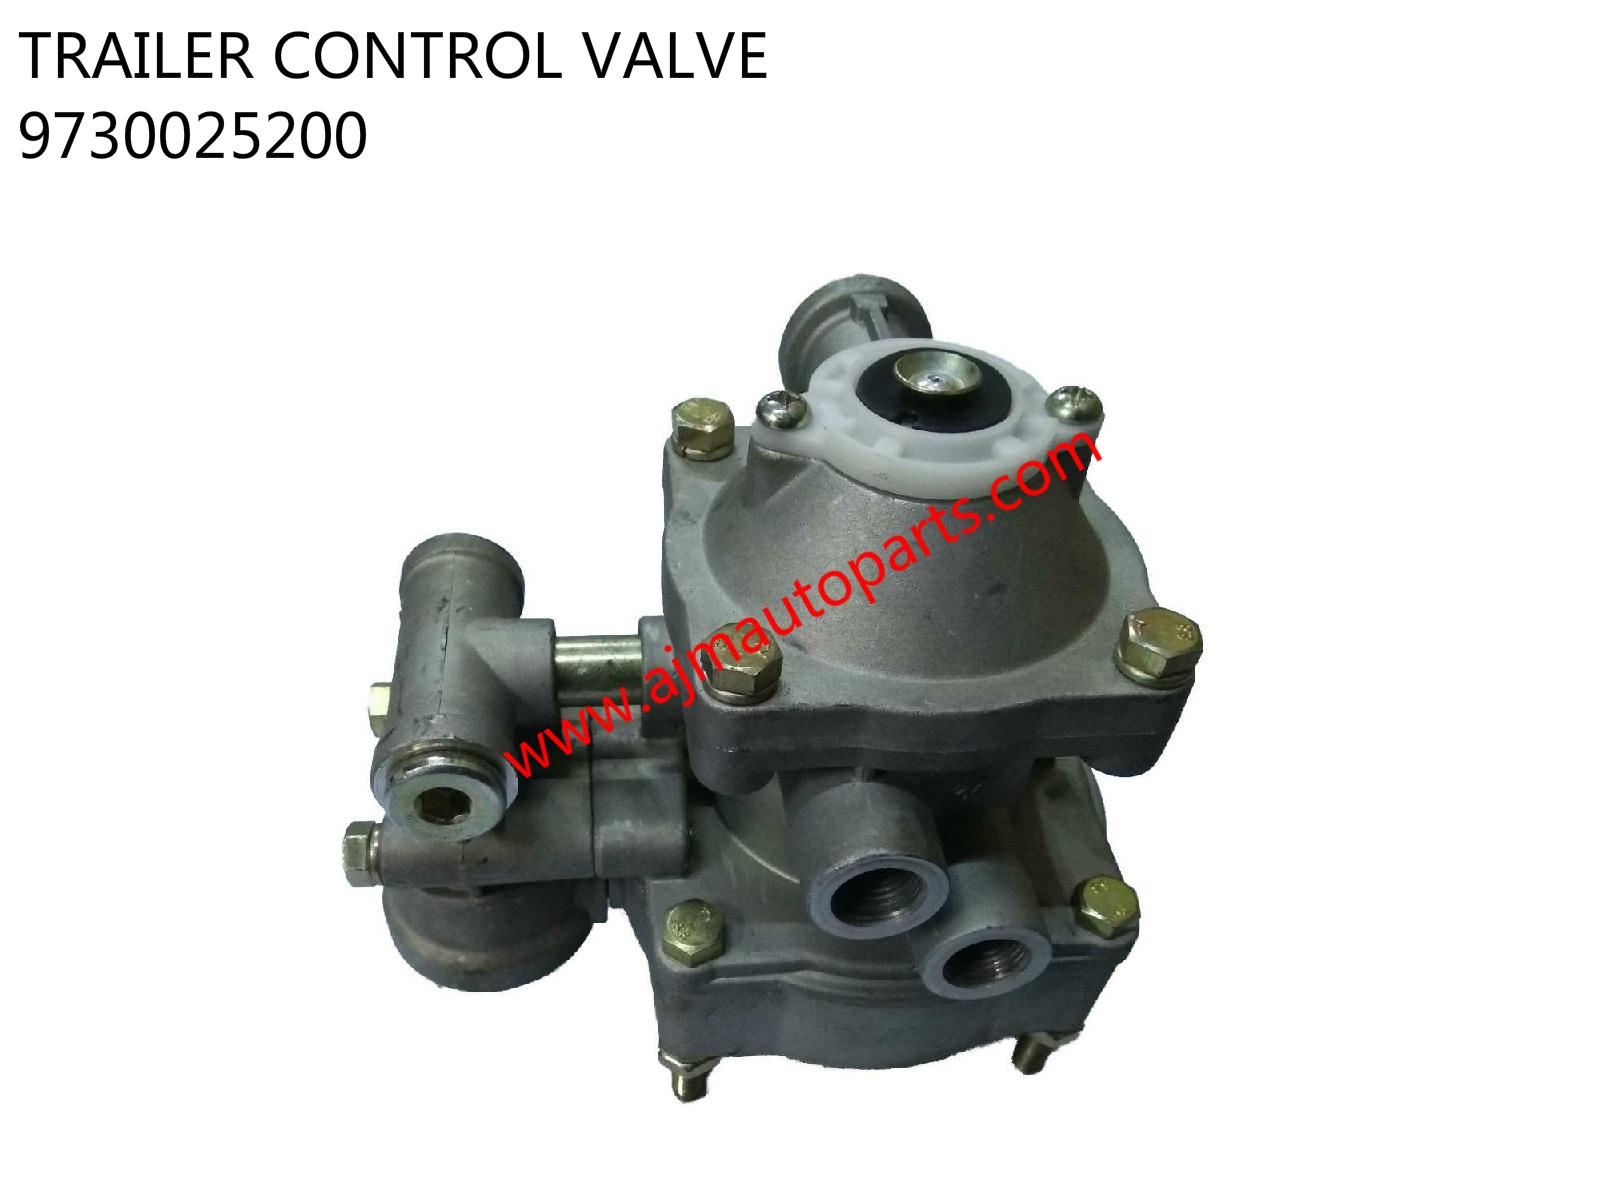 TRAILER CONTROL VALVE-9730025200